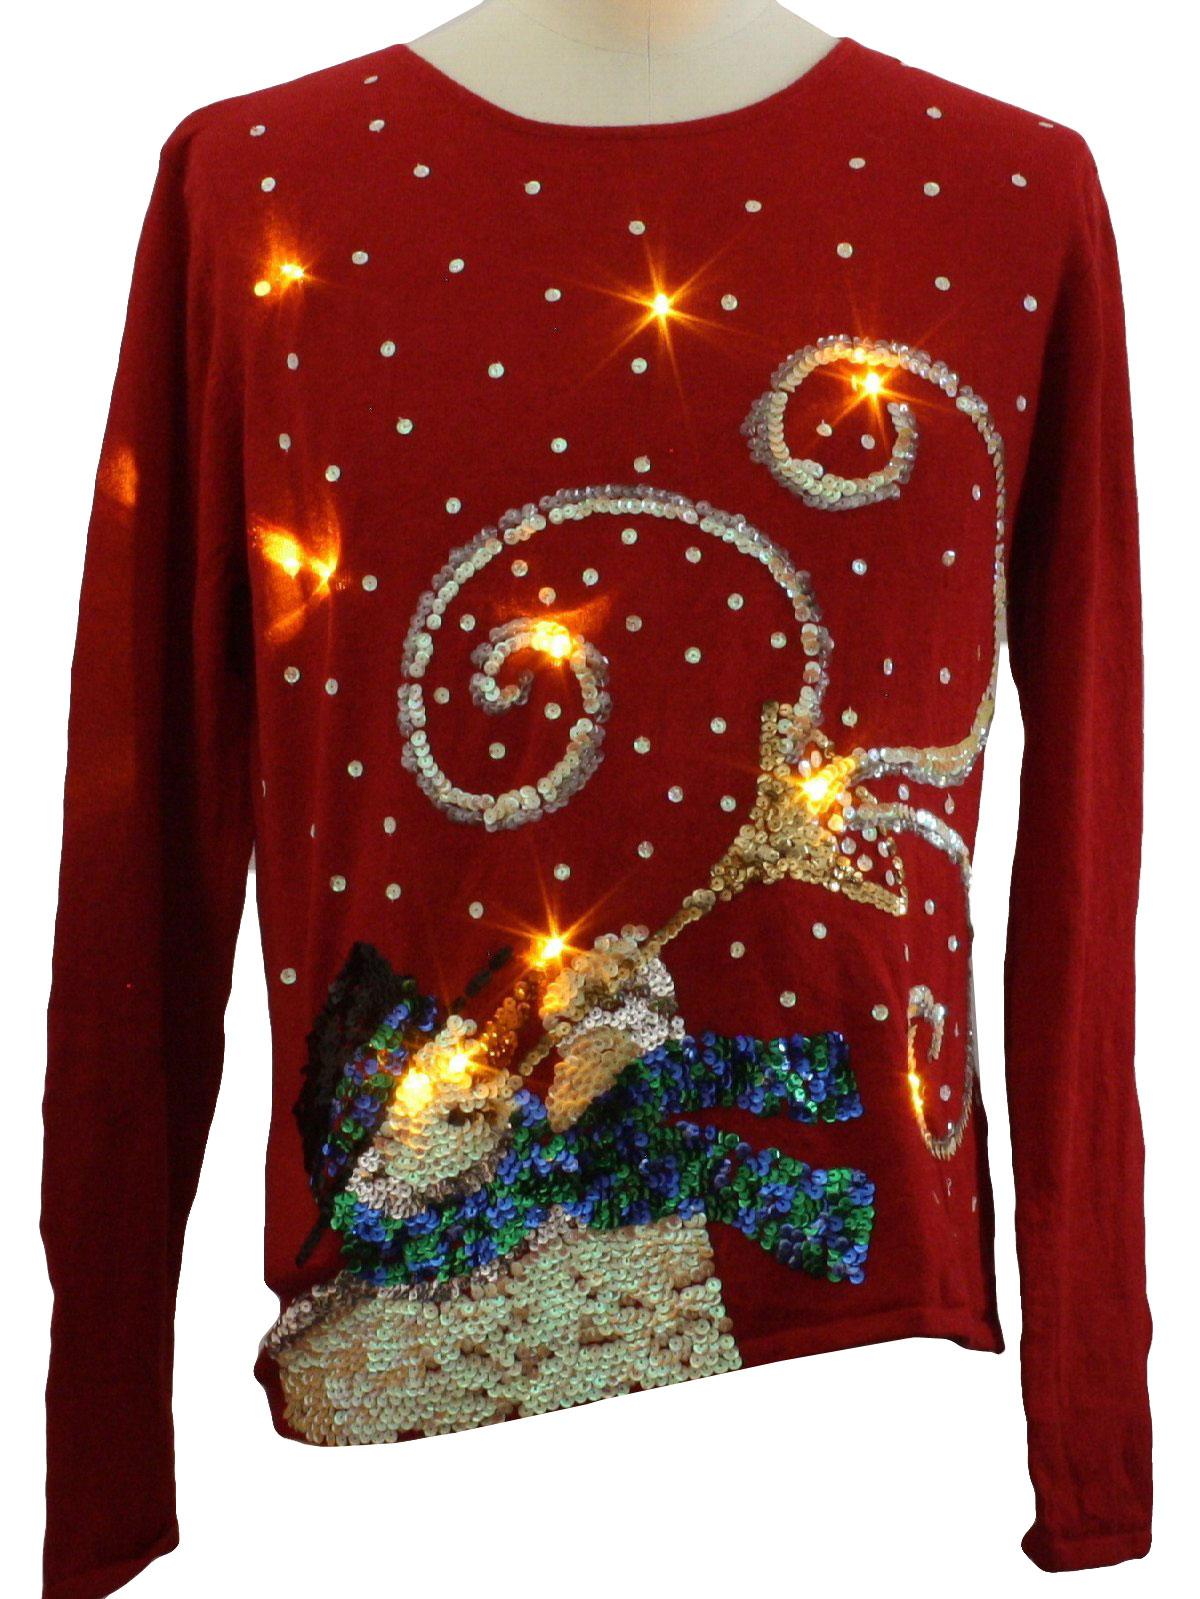 Womens lightup ugly christmas sweater tiara for Over the top ugly christmas sweaters